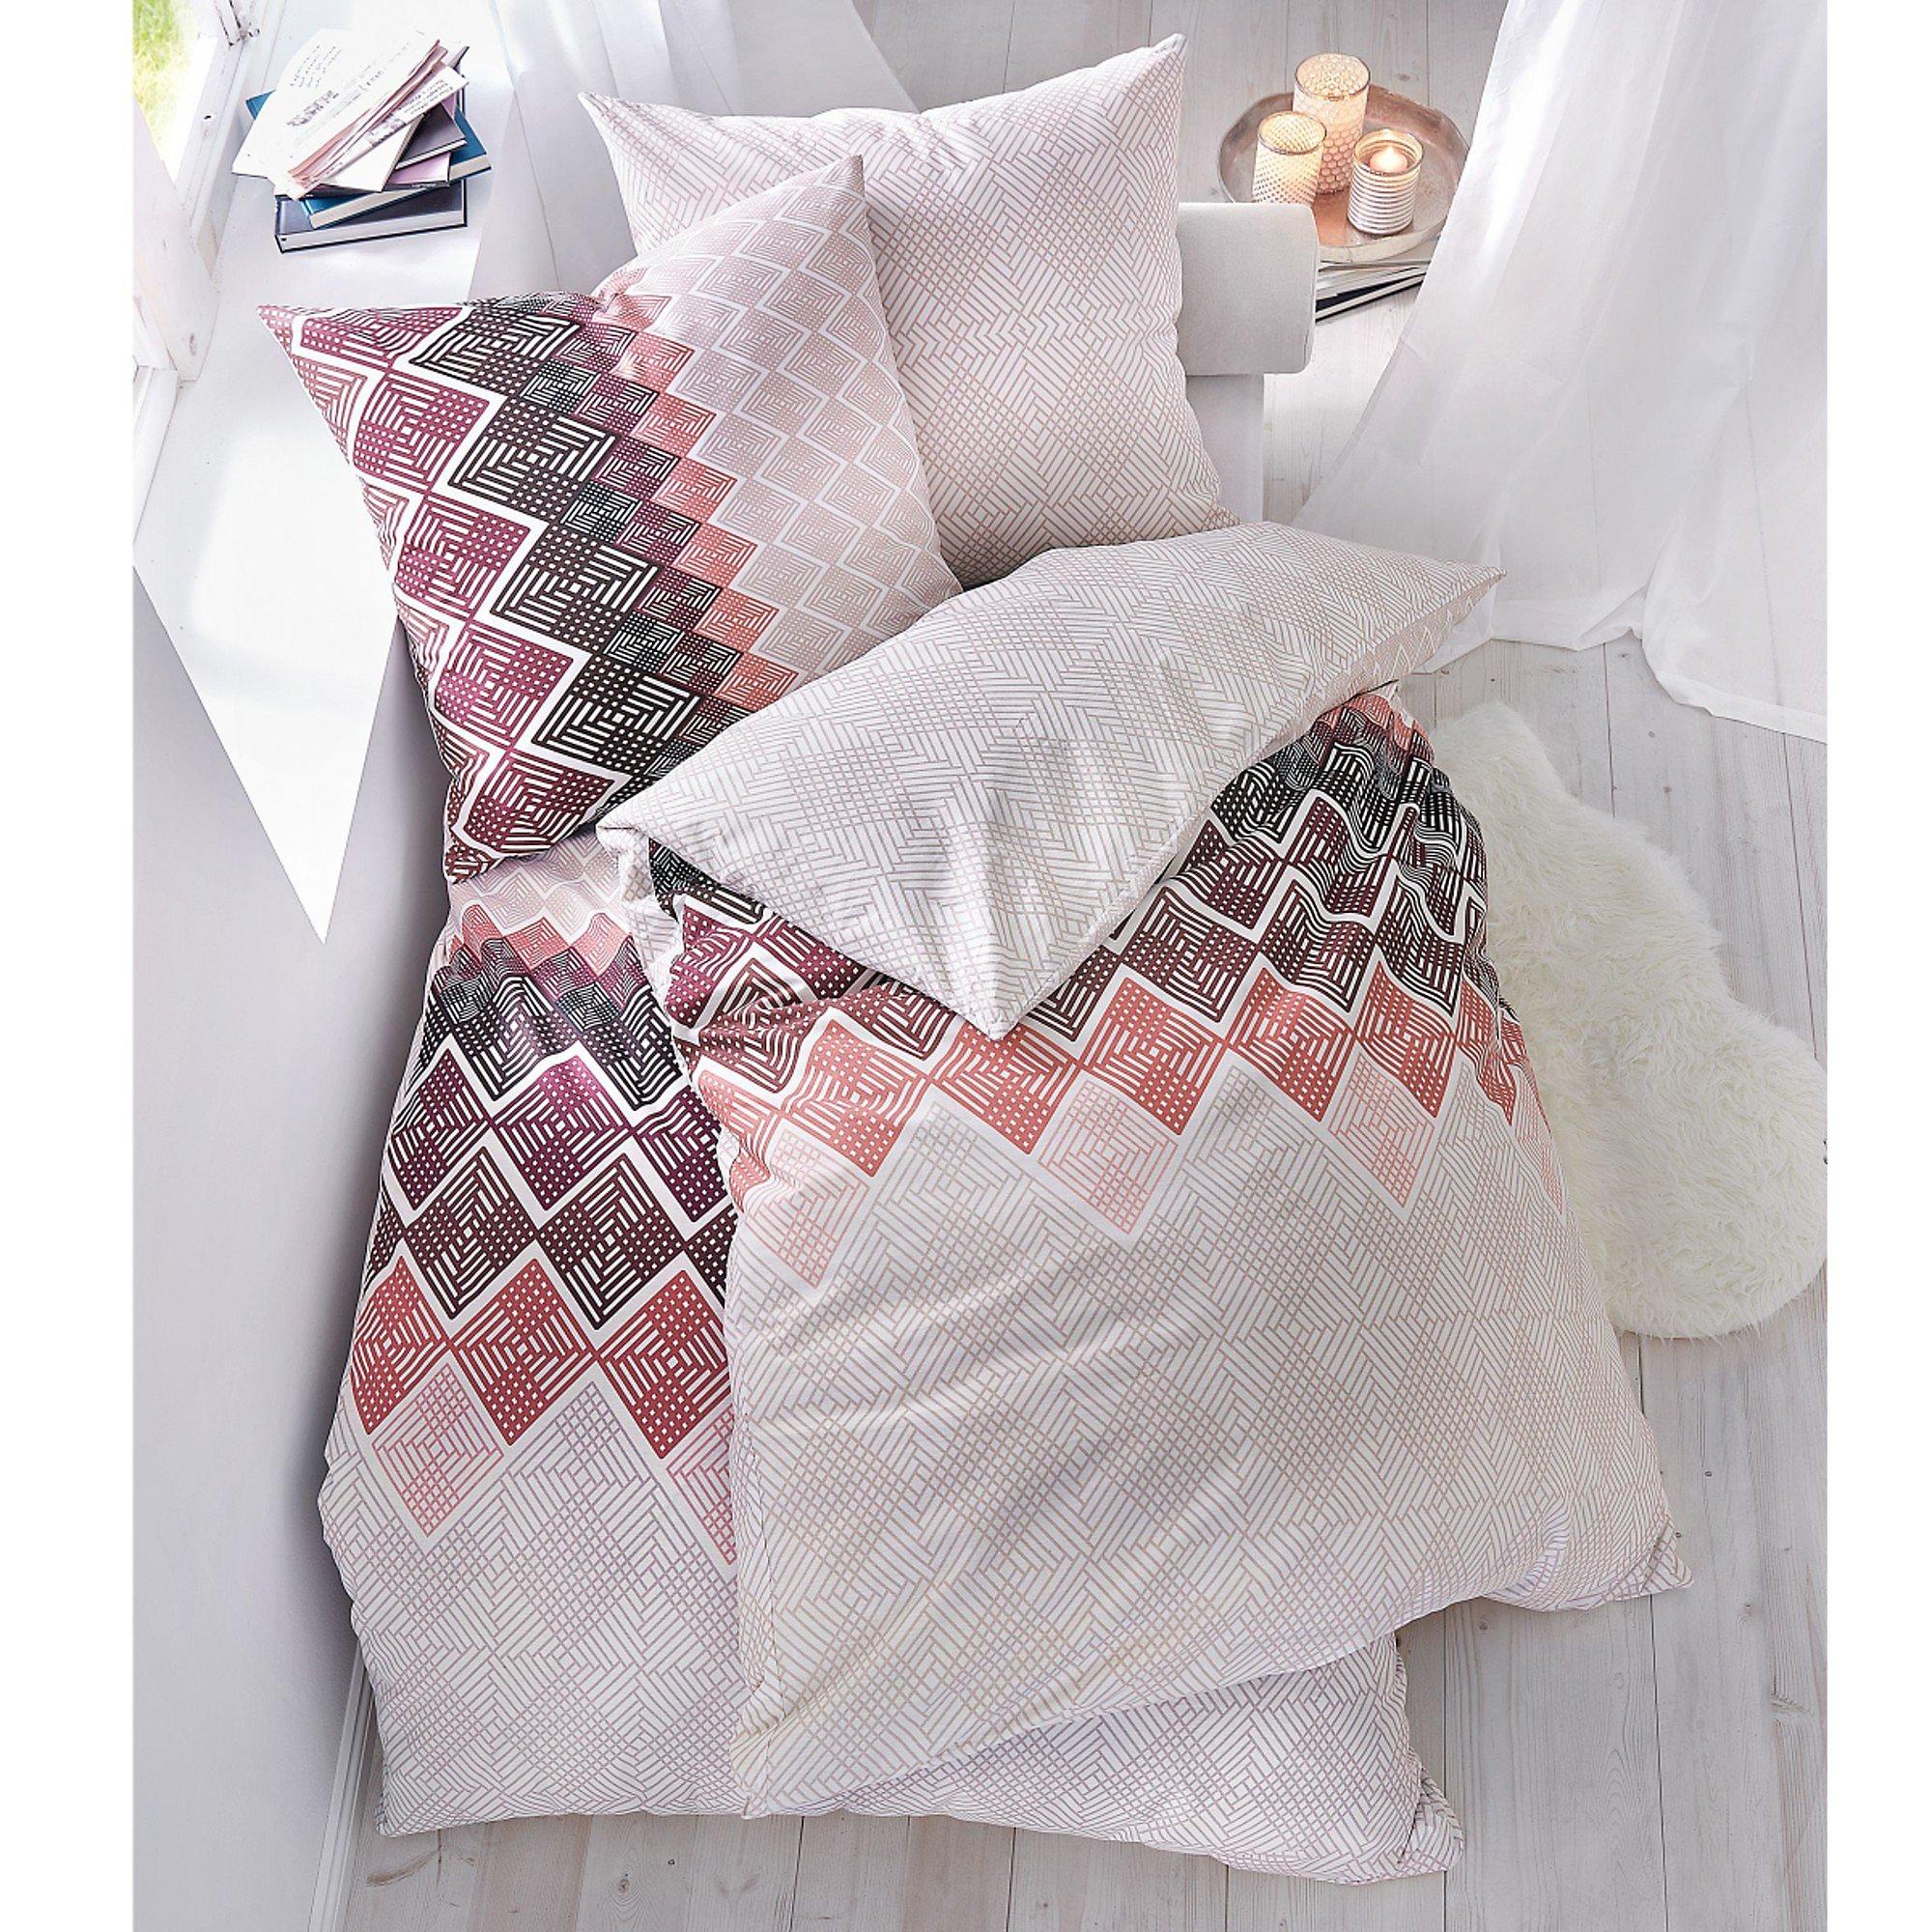 Bettwasche Tilda Weiss Rosa 135 X 200 Cm Bestellen Weltbild At